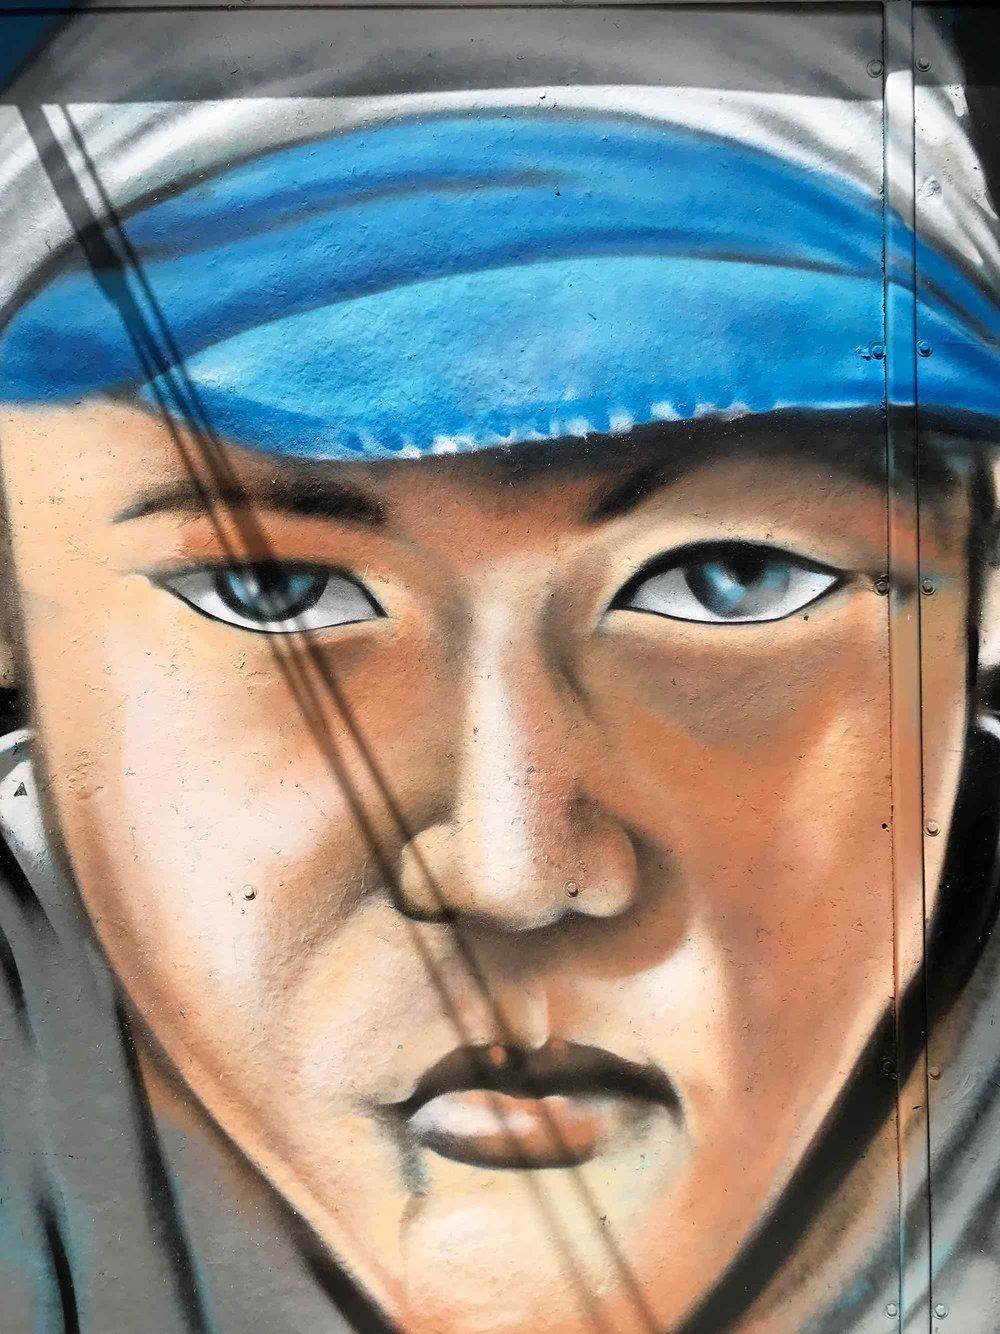 Bogota-street-art-boy-Colombia.jpg